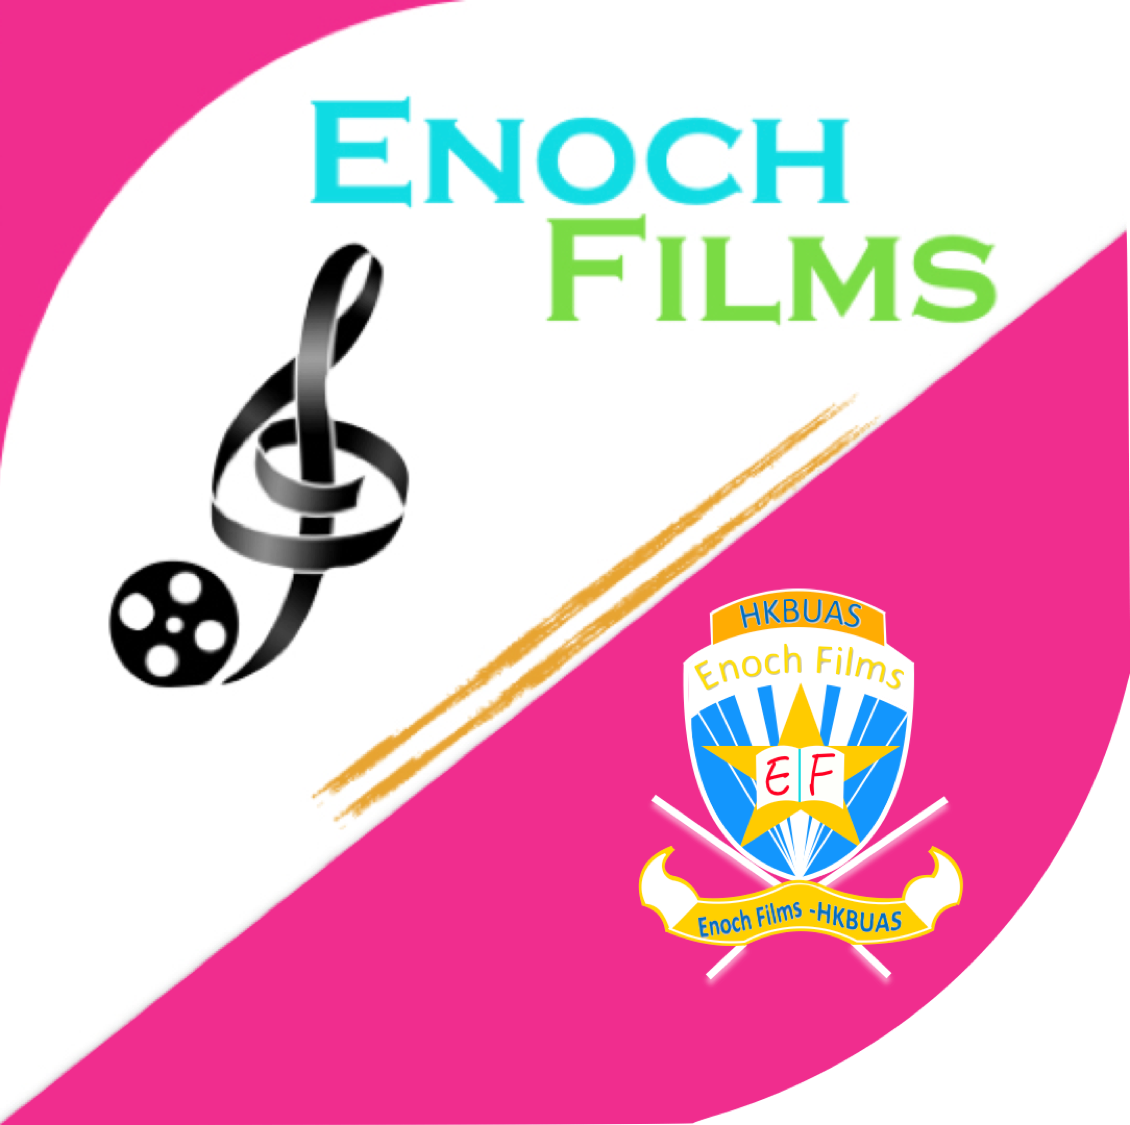 Enoch Films -HKBUAS messages sticker-10